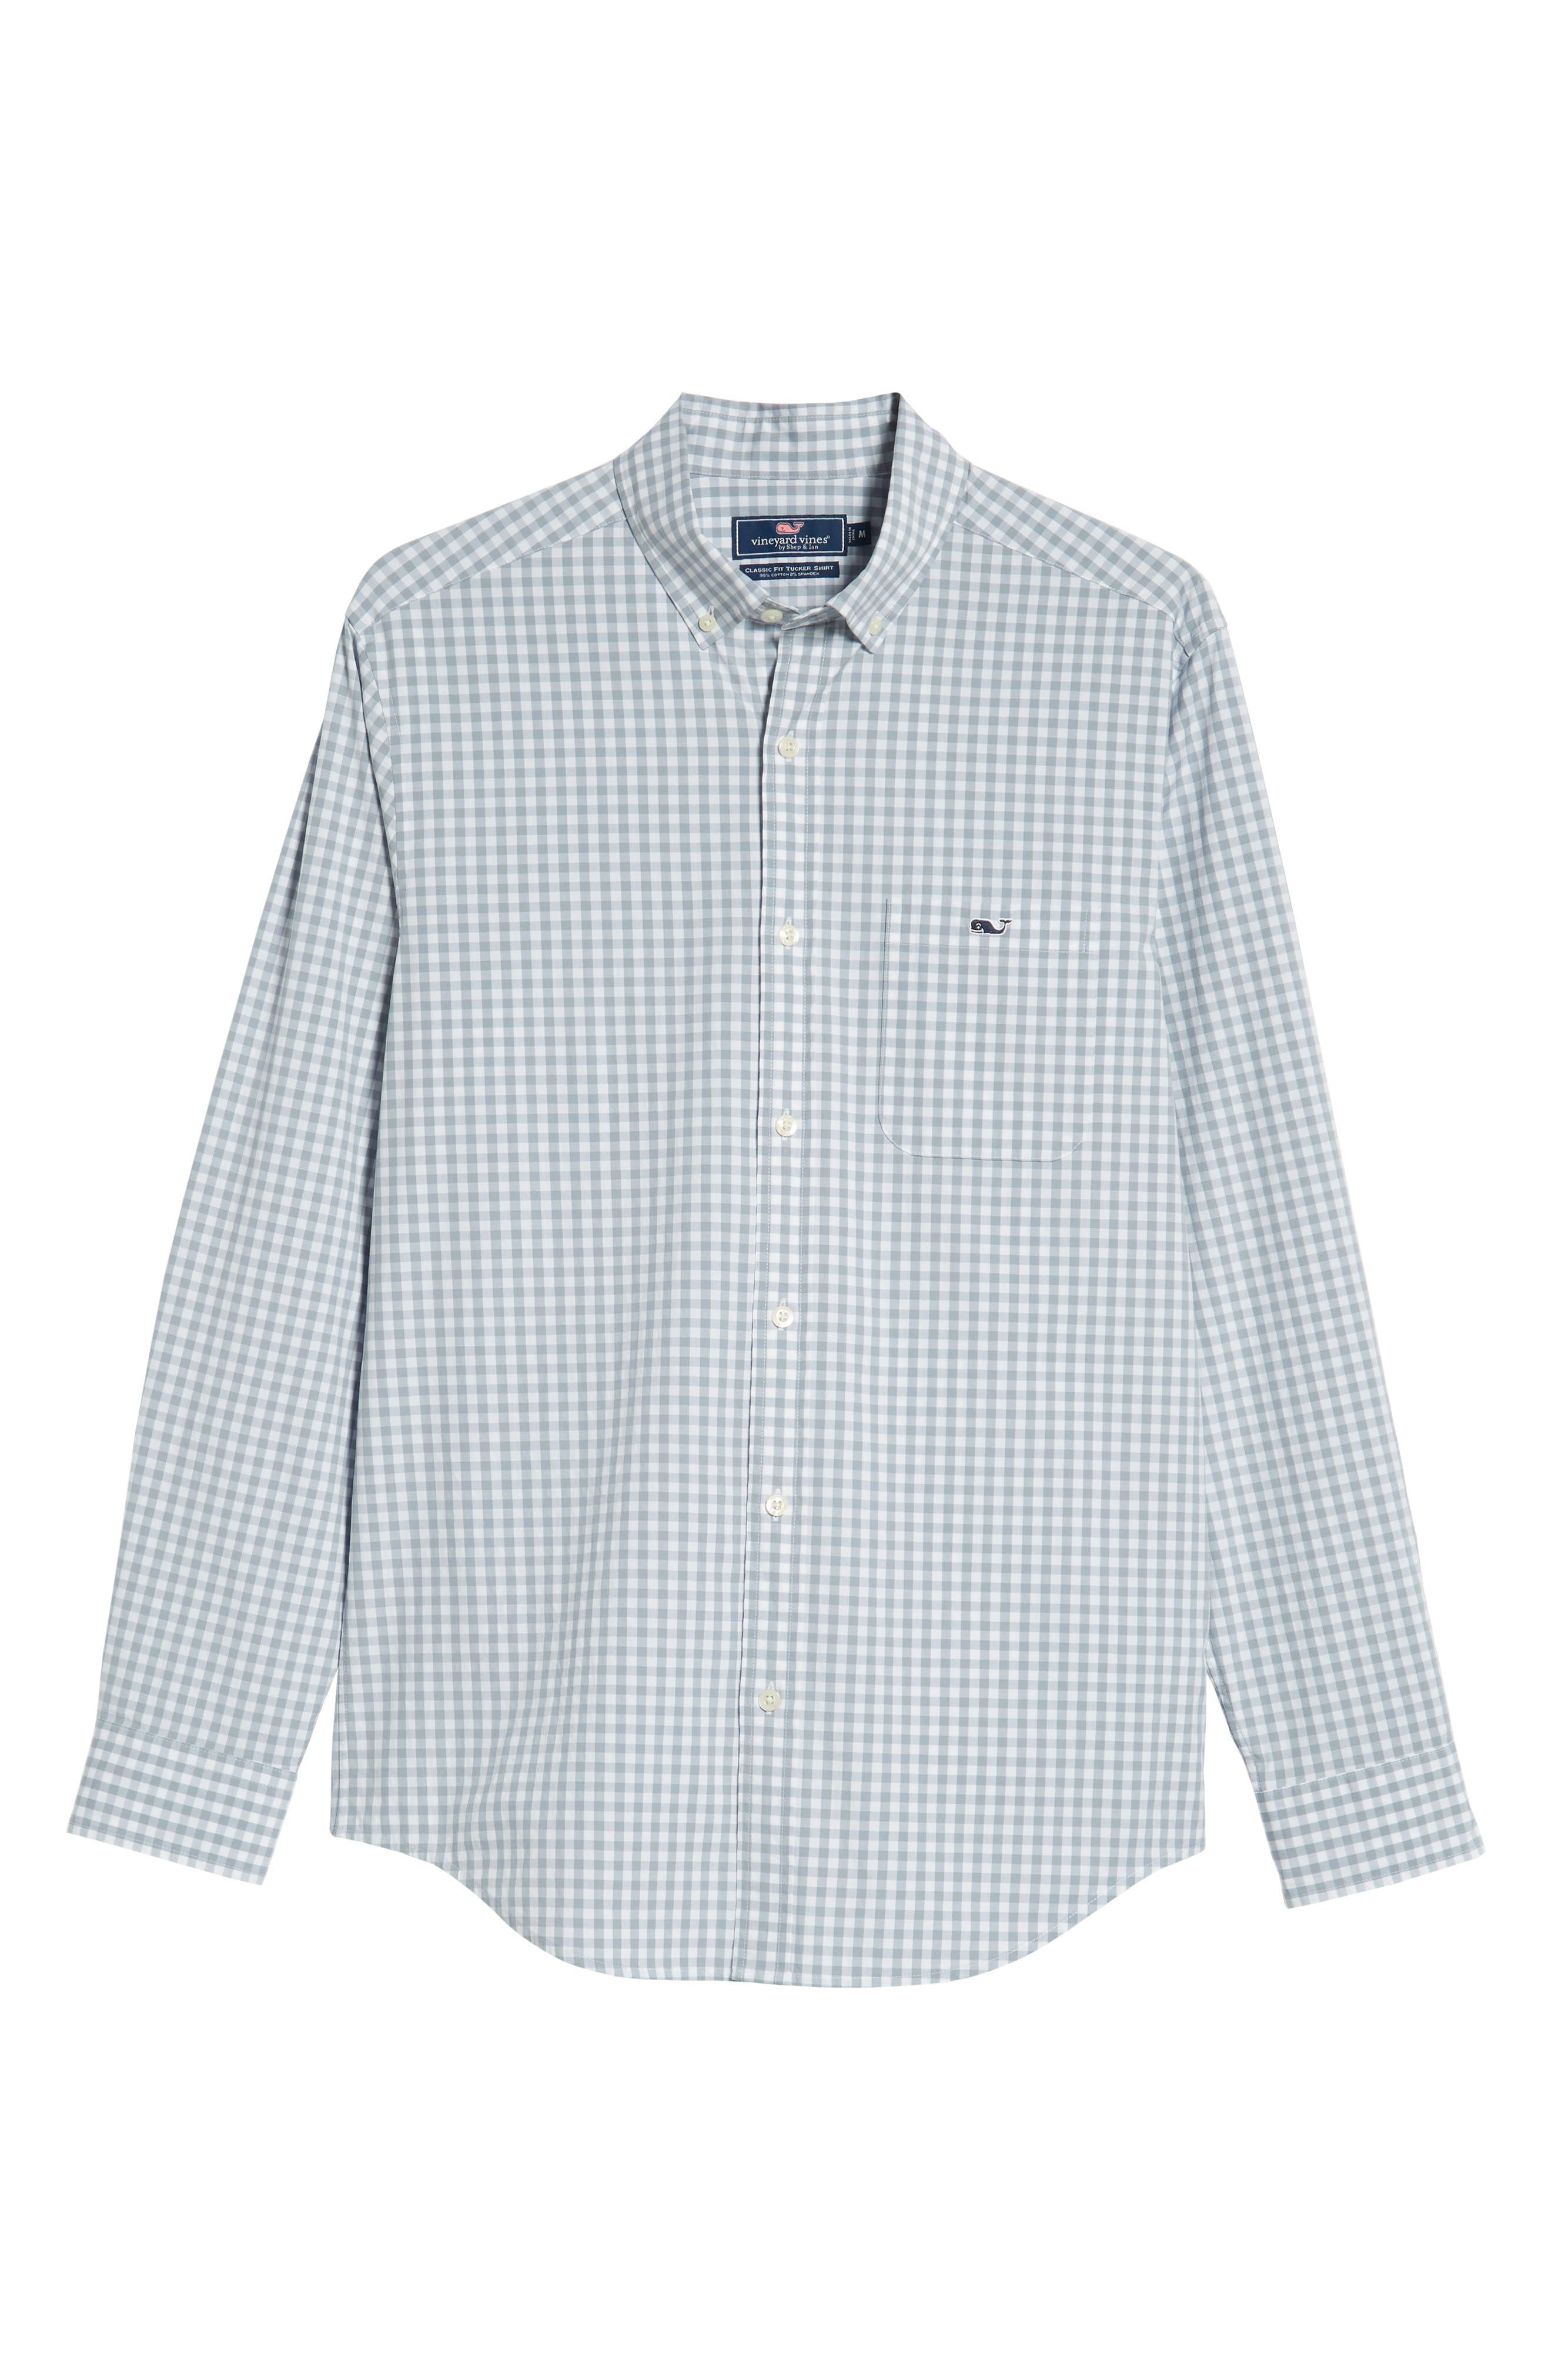 VINEYARD VINES, Carleton Classic Fit Gingham Buttondown Shirt, Alternate thumbnail 5, color, 023